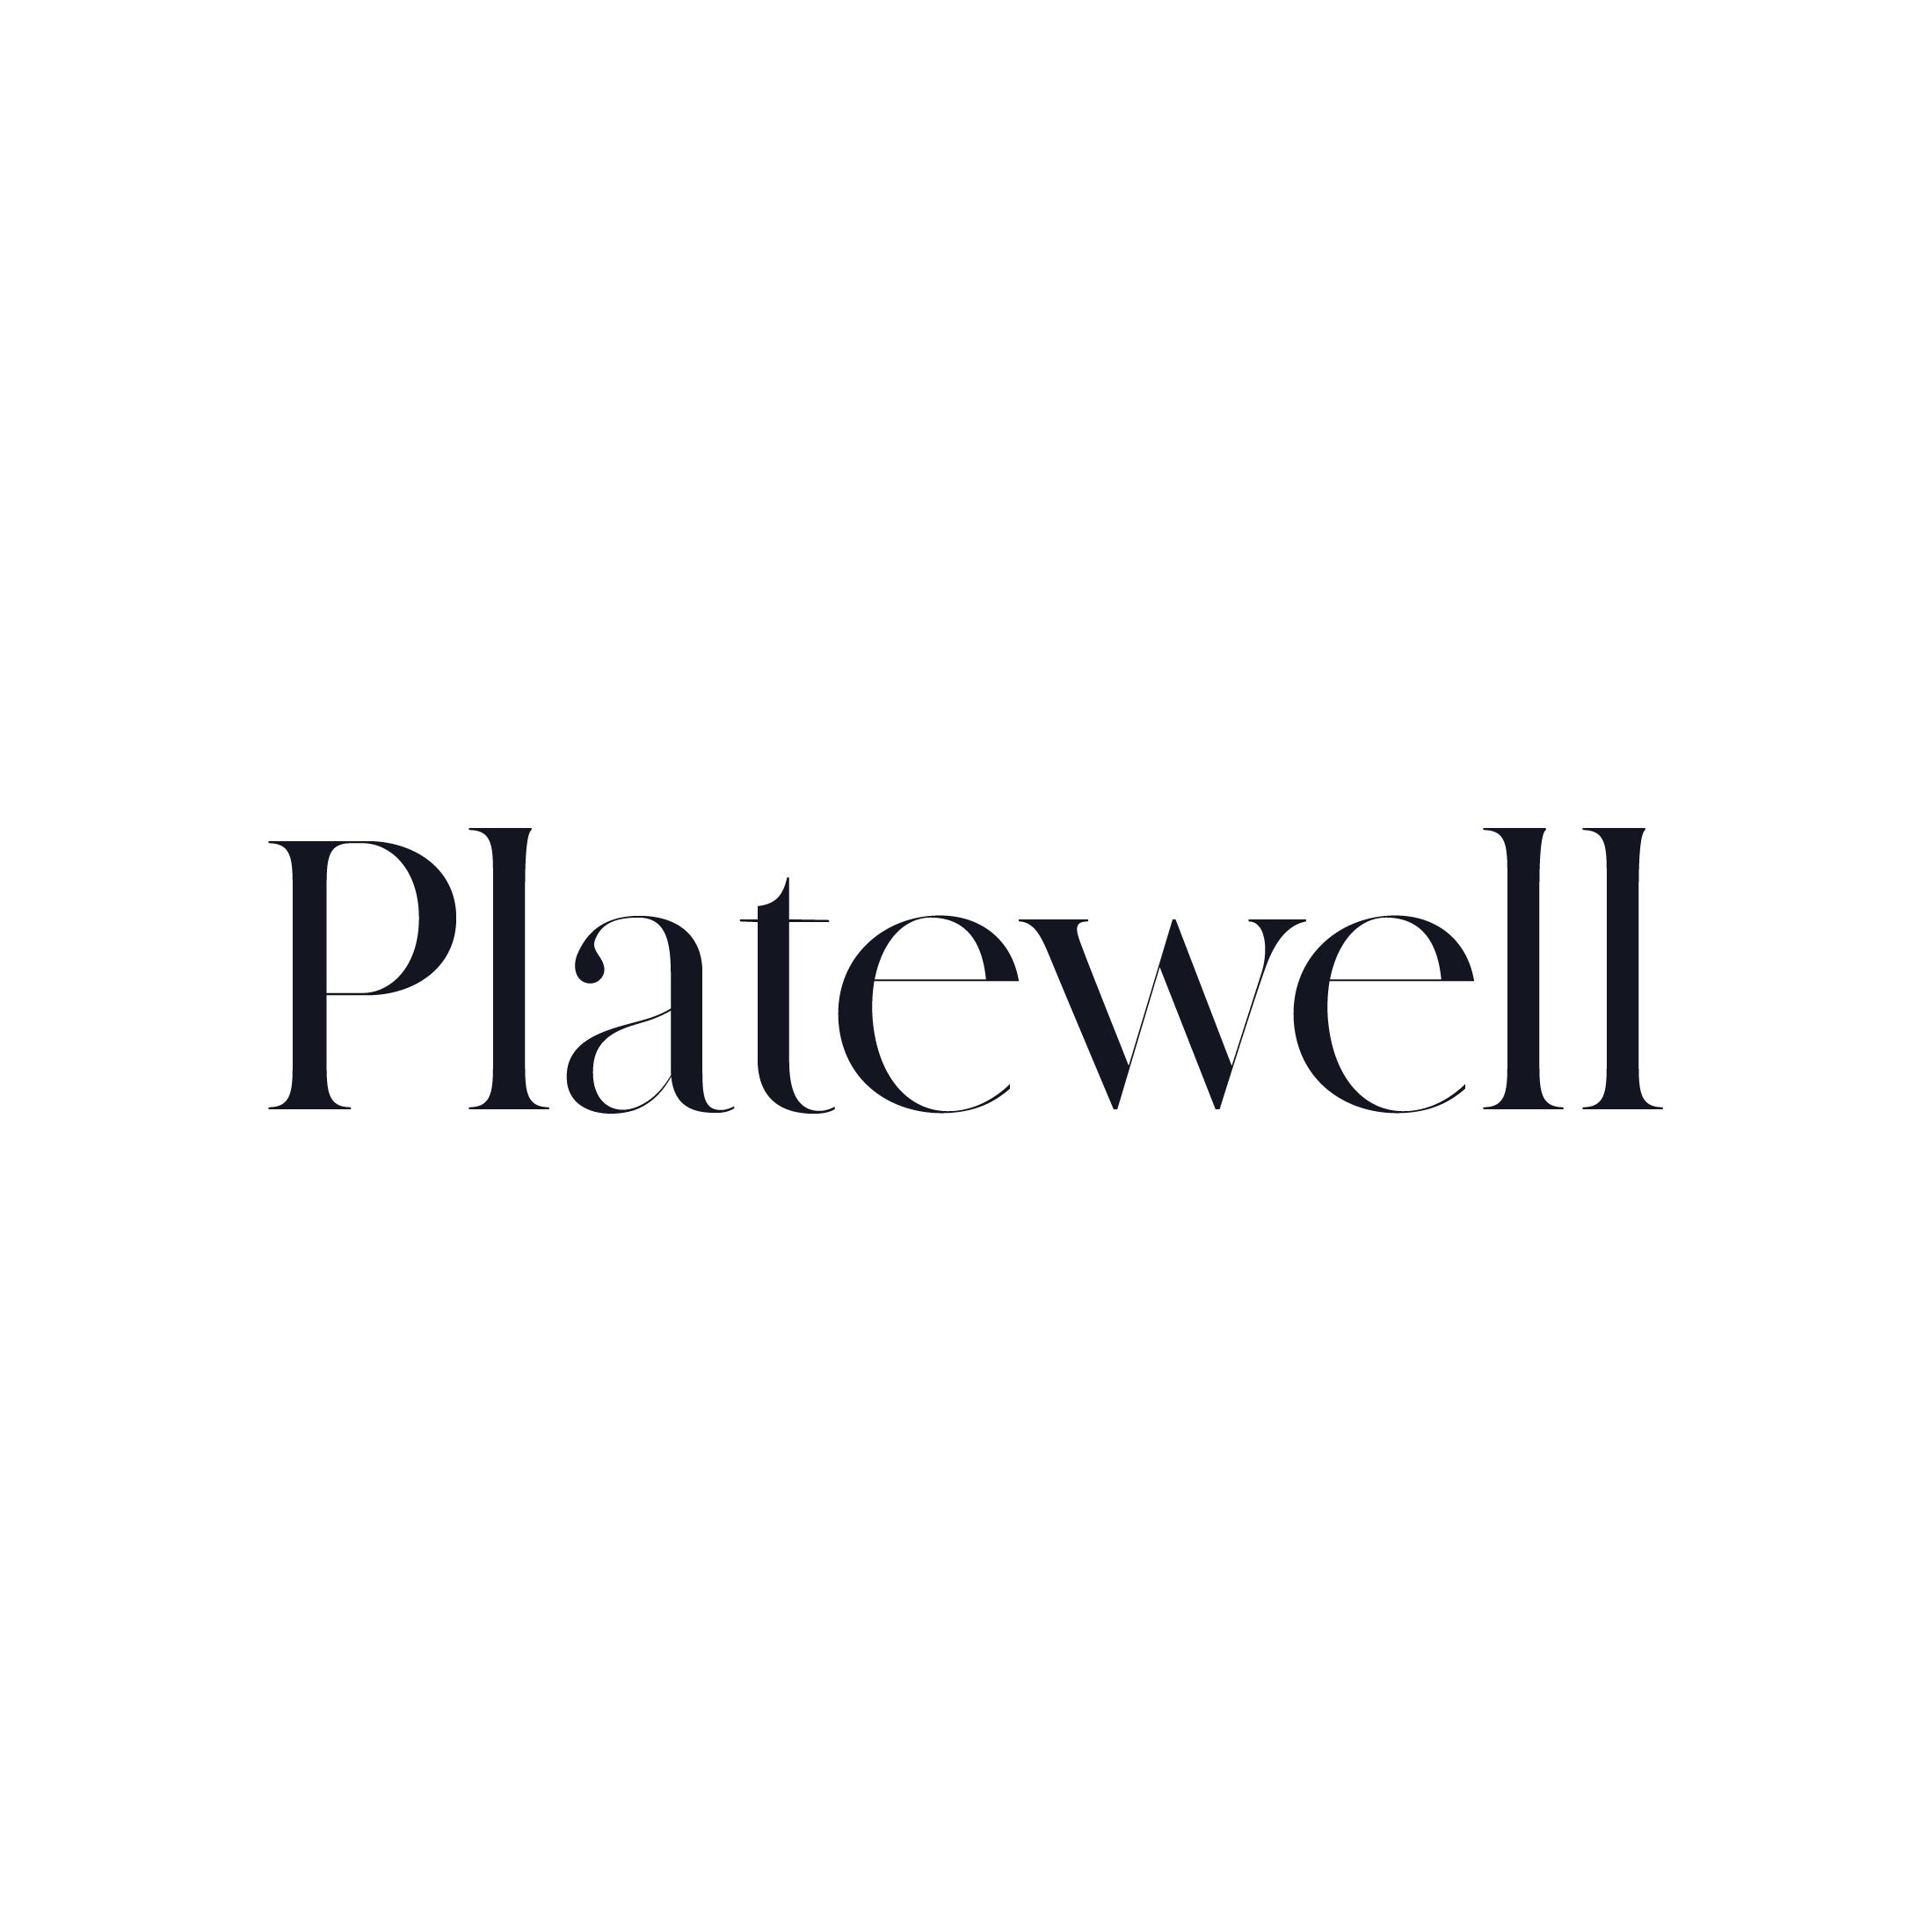 Platewell